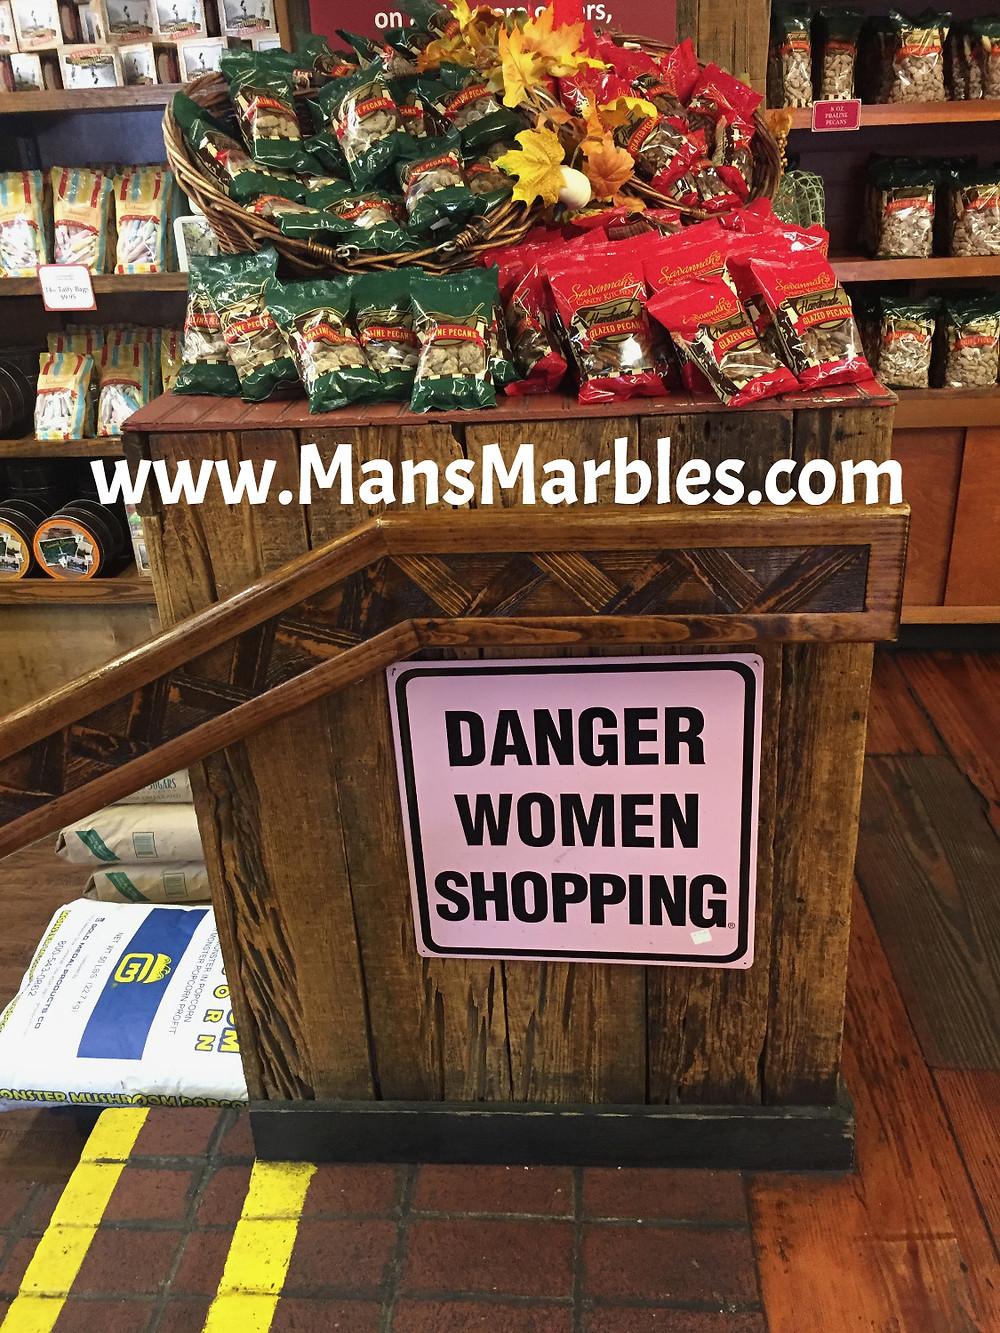 Danger women shopping sign at River Street Sweets